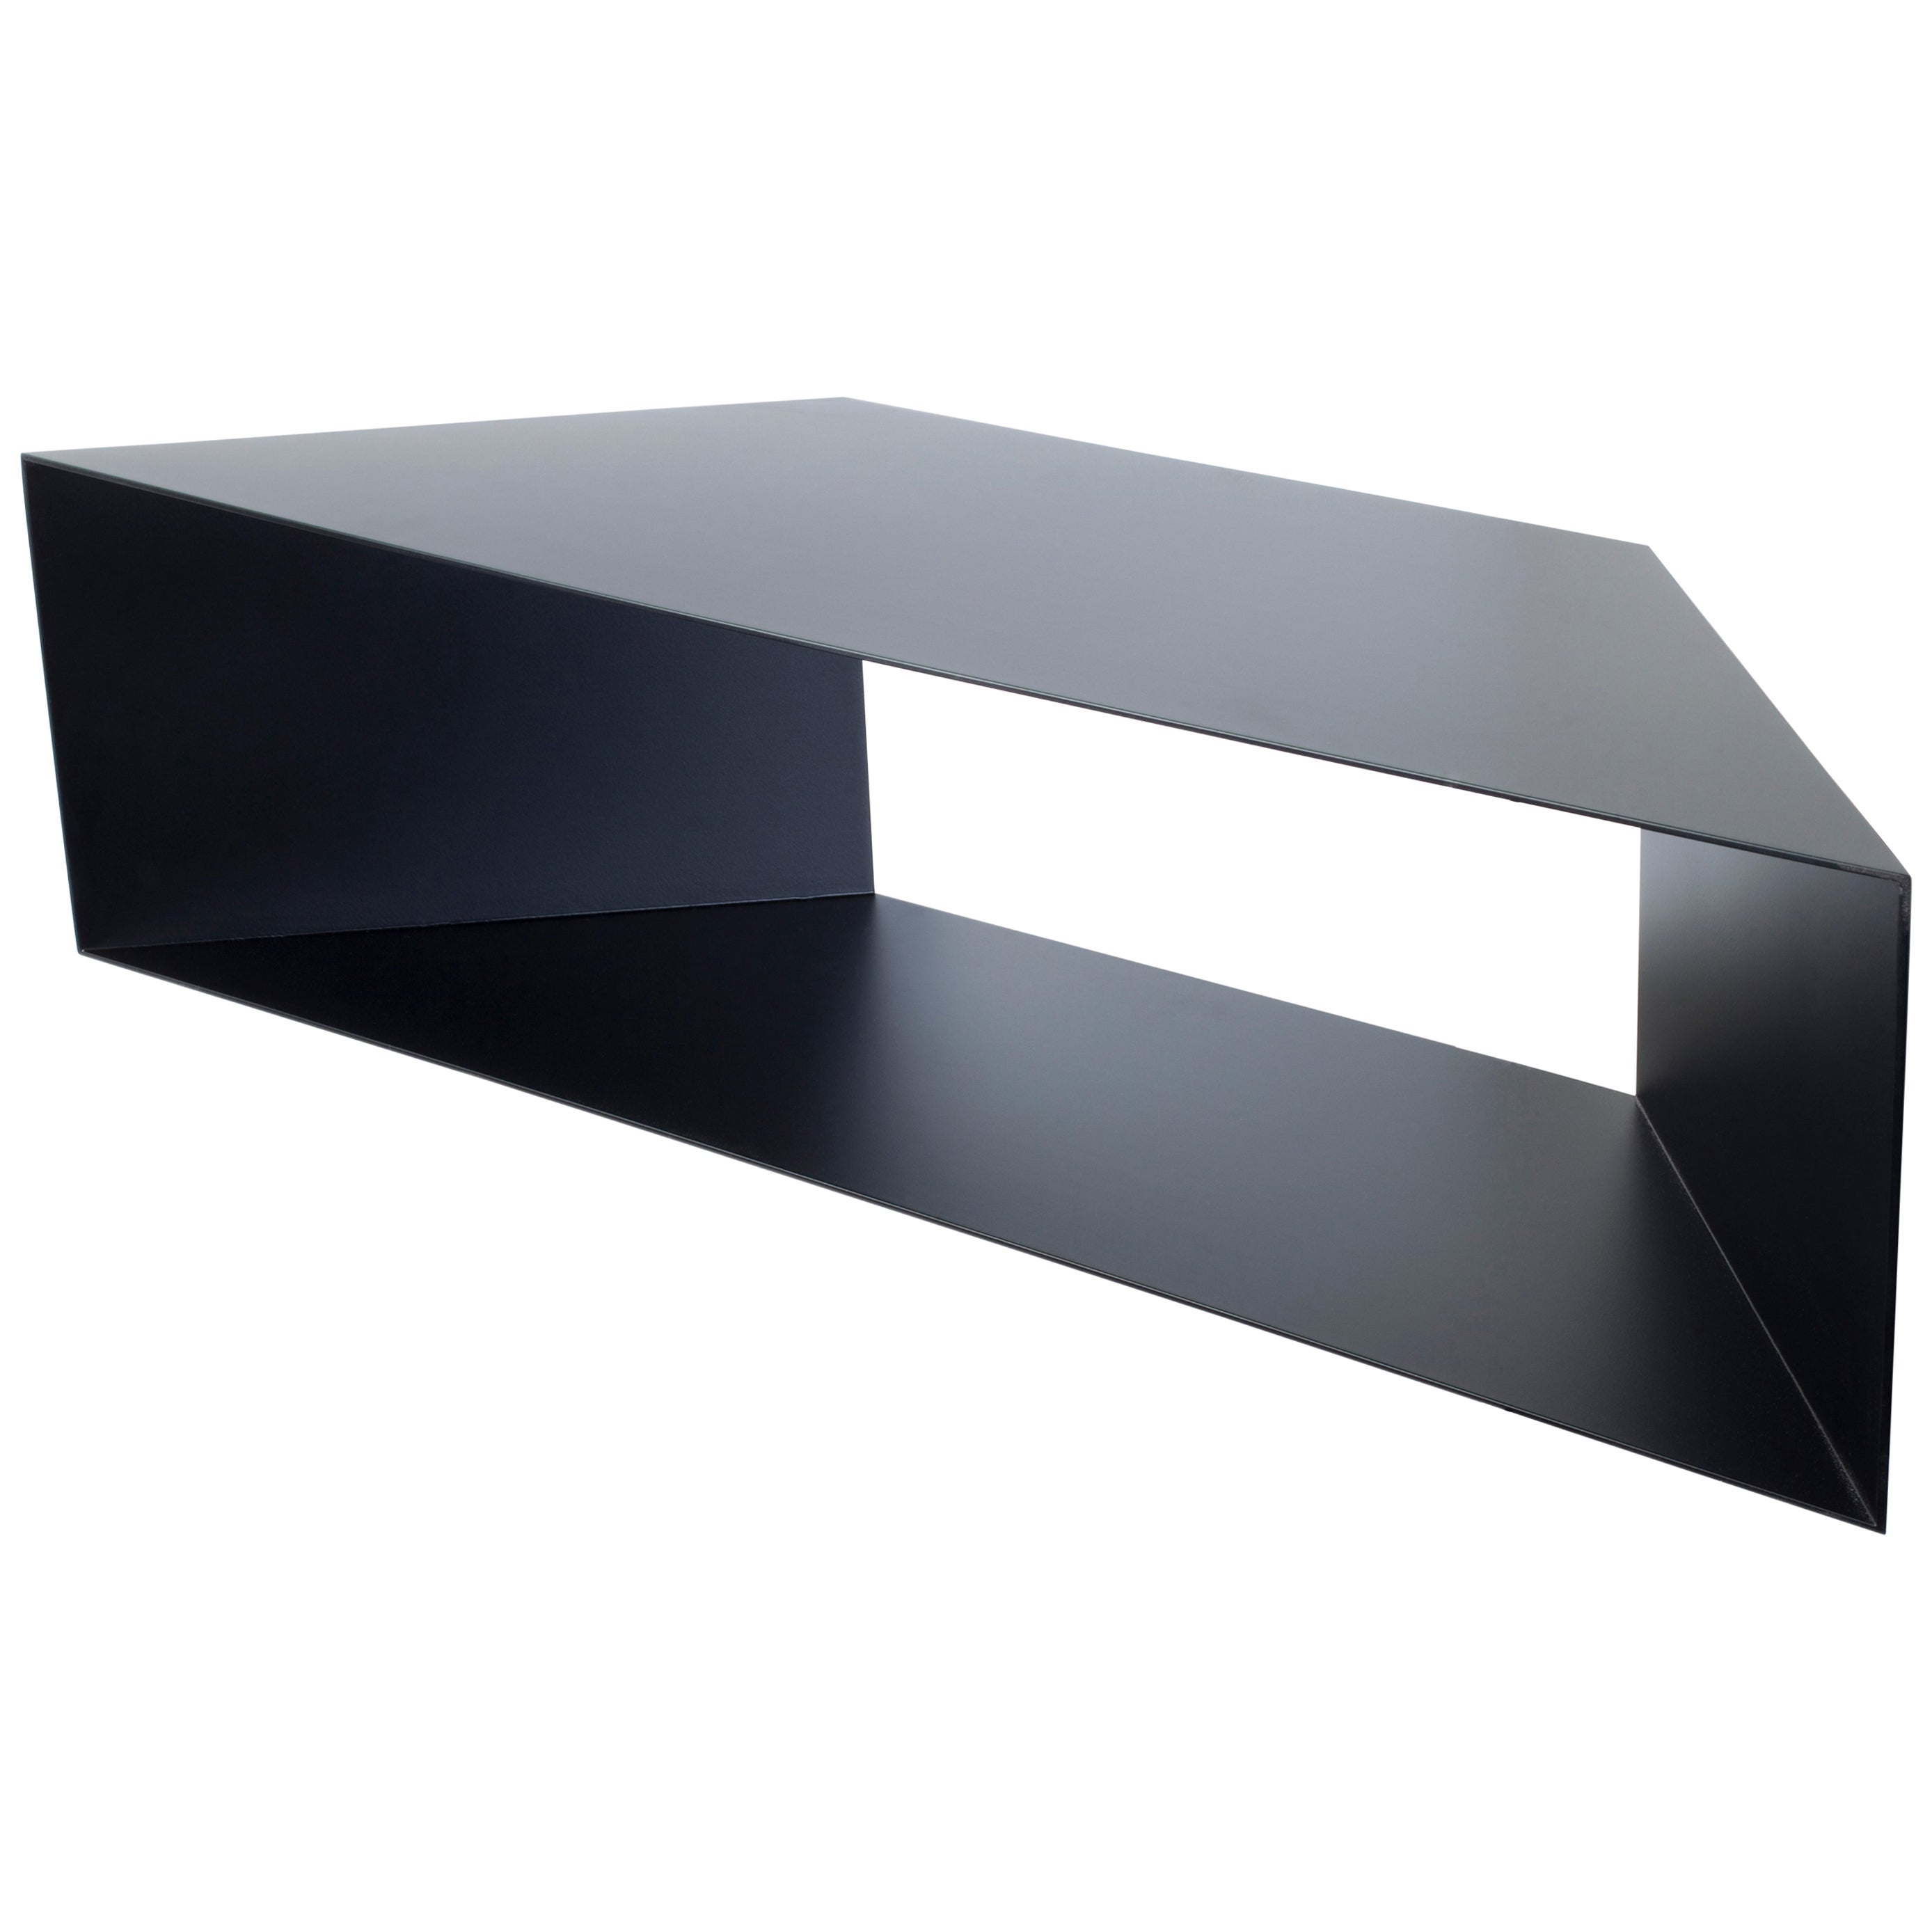 Contemporary Minimal Sculptural Metal Black Corner Shelf, USA, in Stock